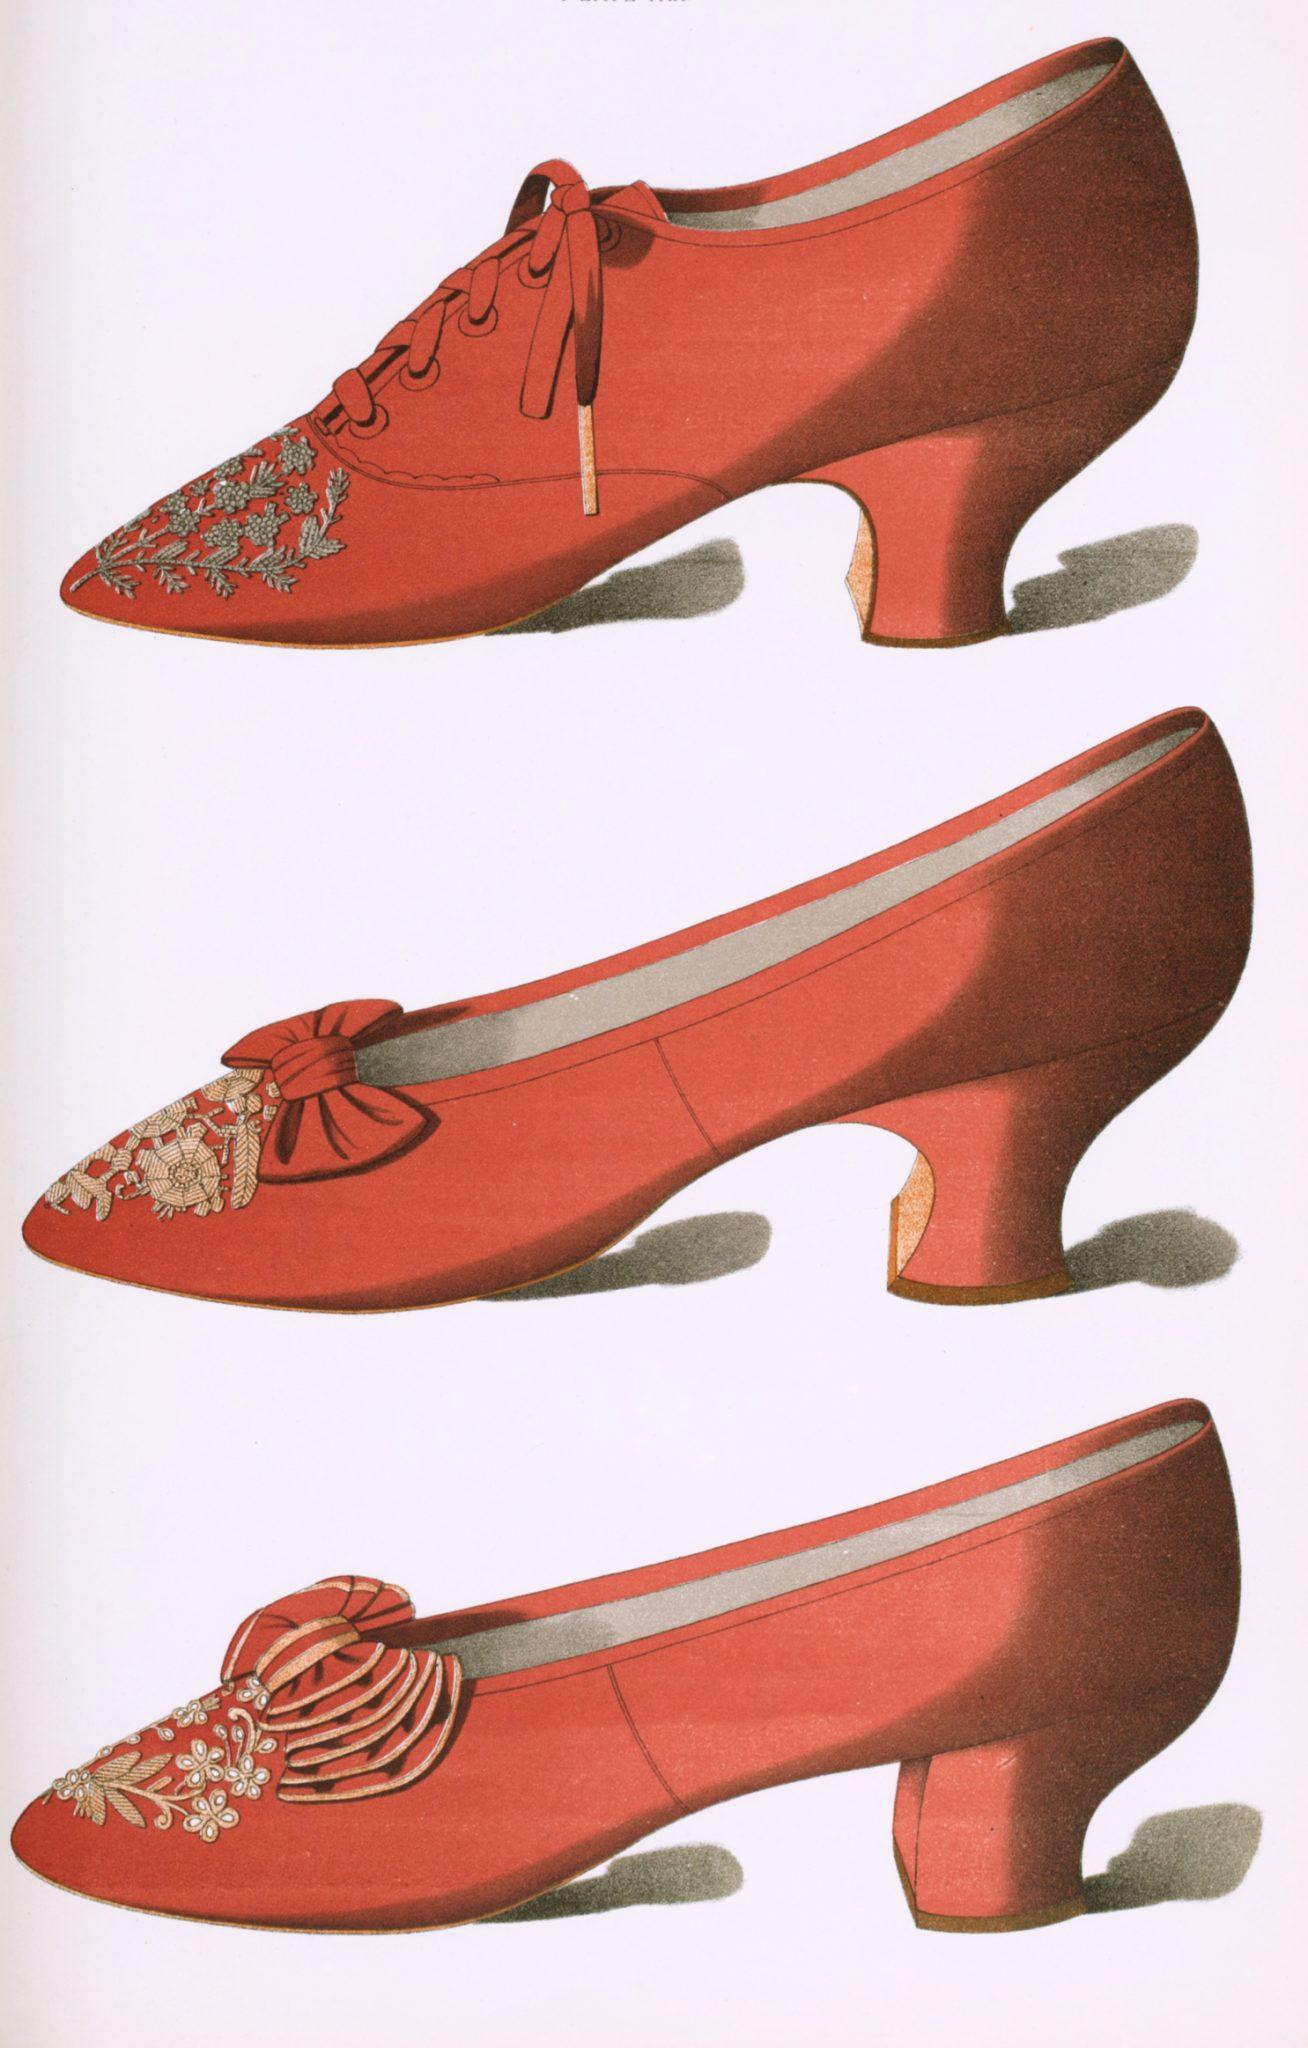 Public domain red shoes illustration